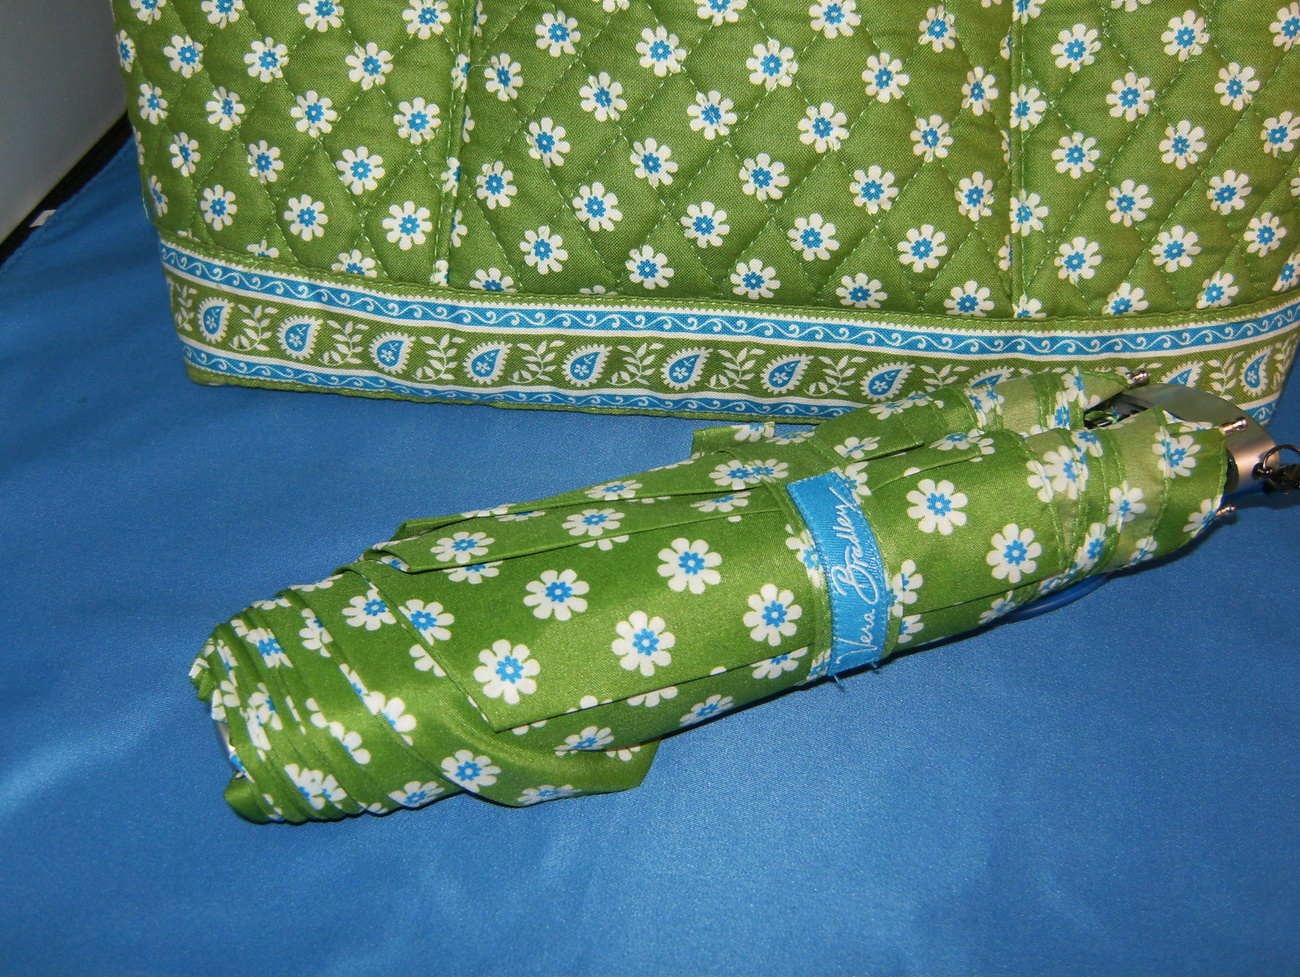 Vera Bradley Green Apple Purse and Matching Umbrella